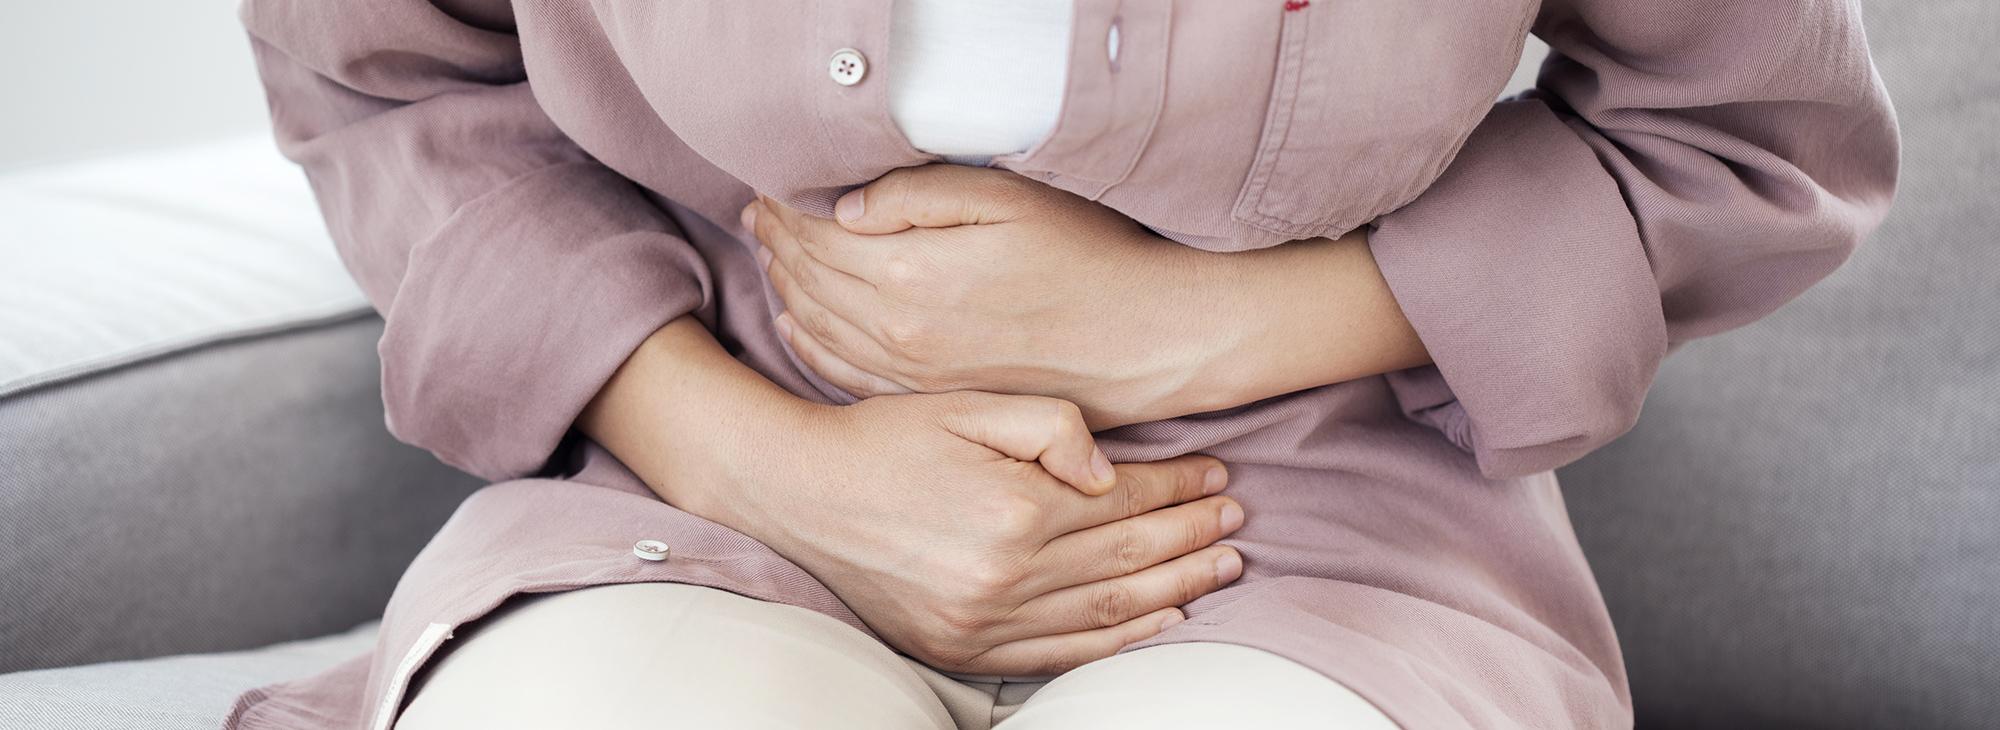 Boala de reflux gastroesofagian: cauze, simptome, remedii   sudstil.ro